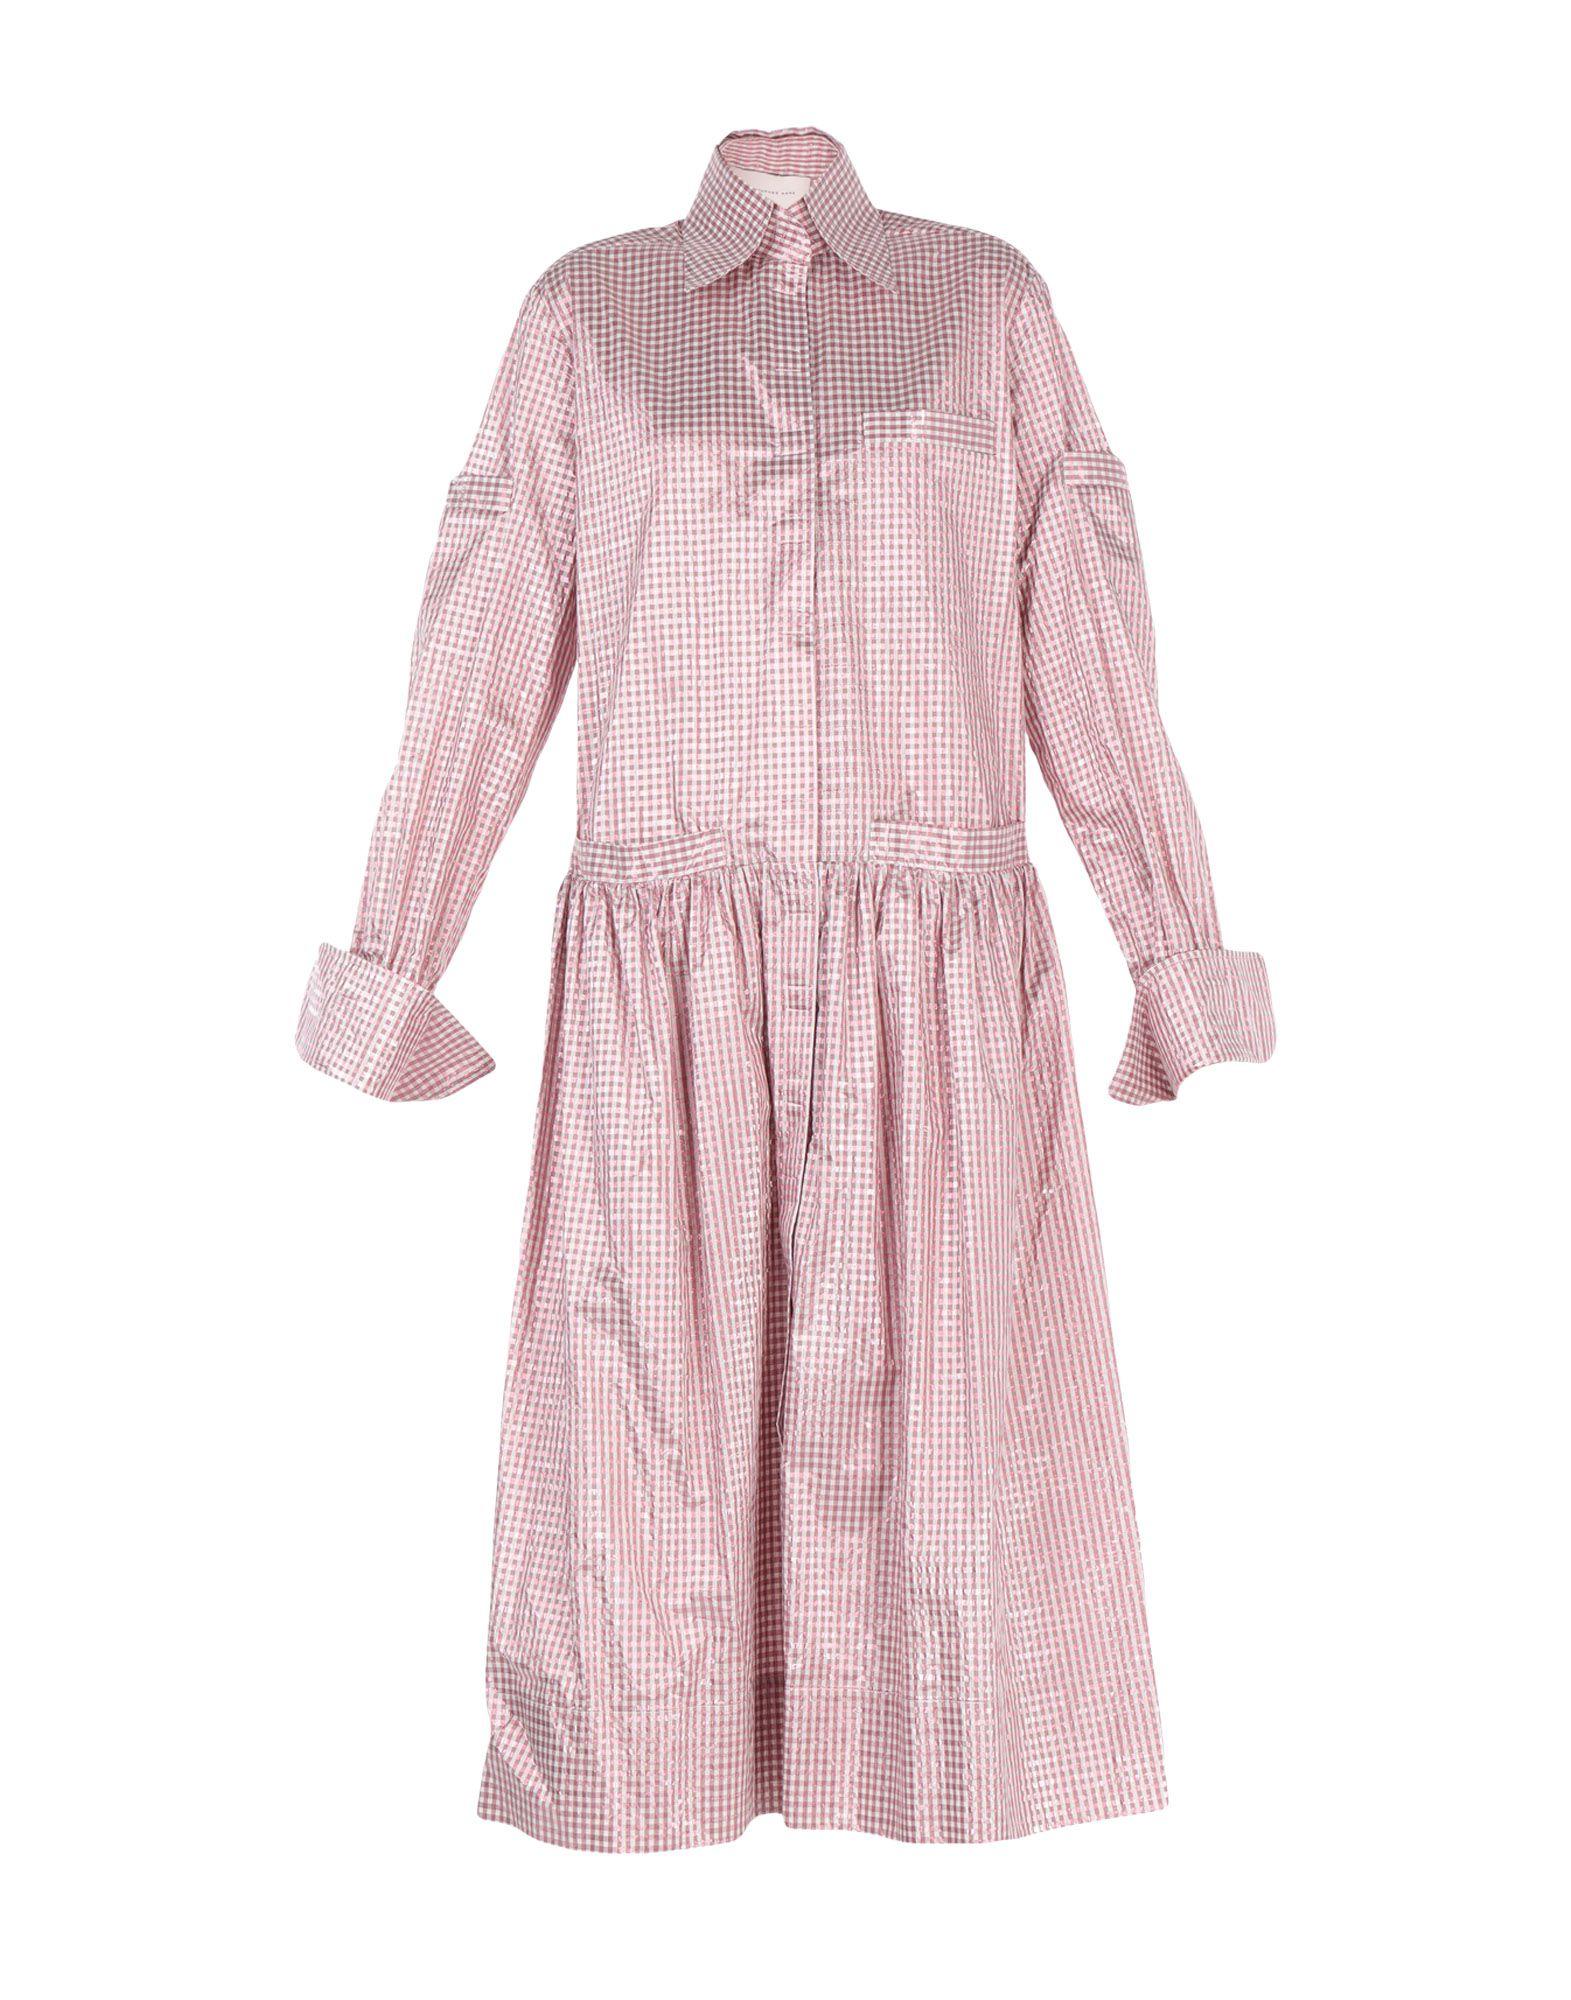 CHRISTOPHER KANE Платье длиной 3/4 рубашка мужская christopher kane gb97715 2014